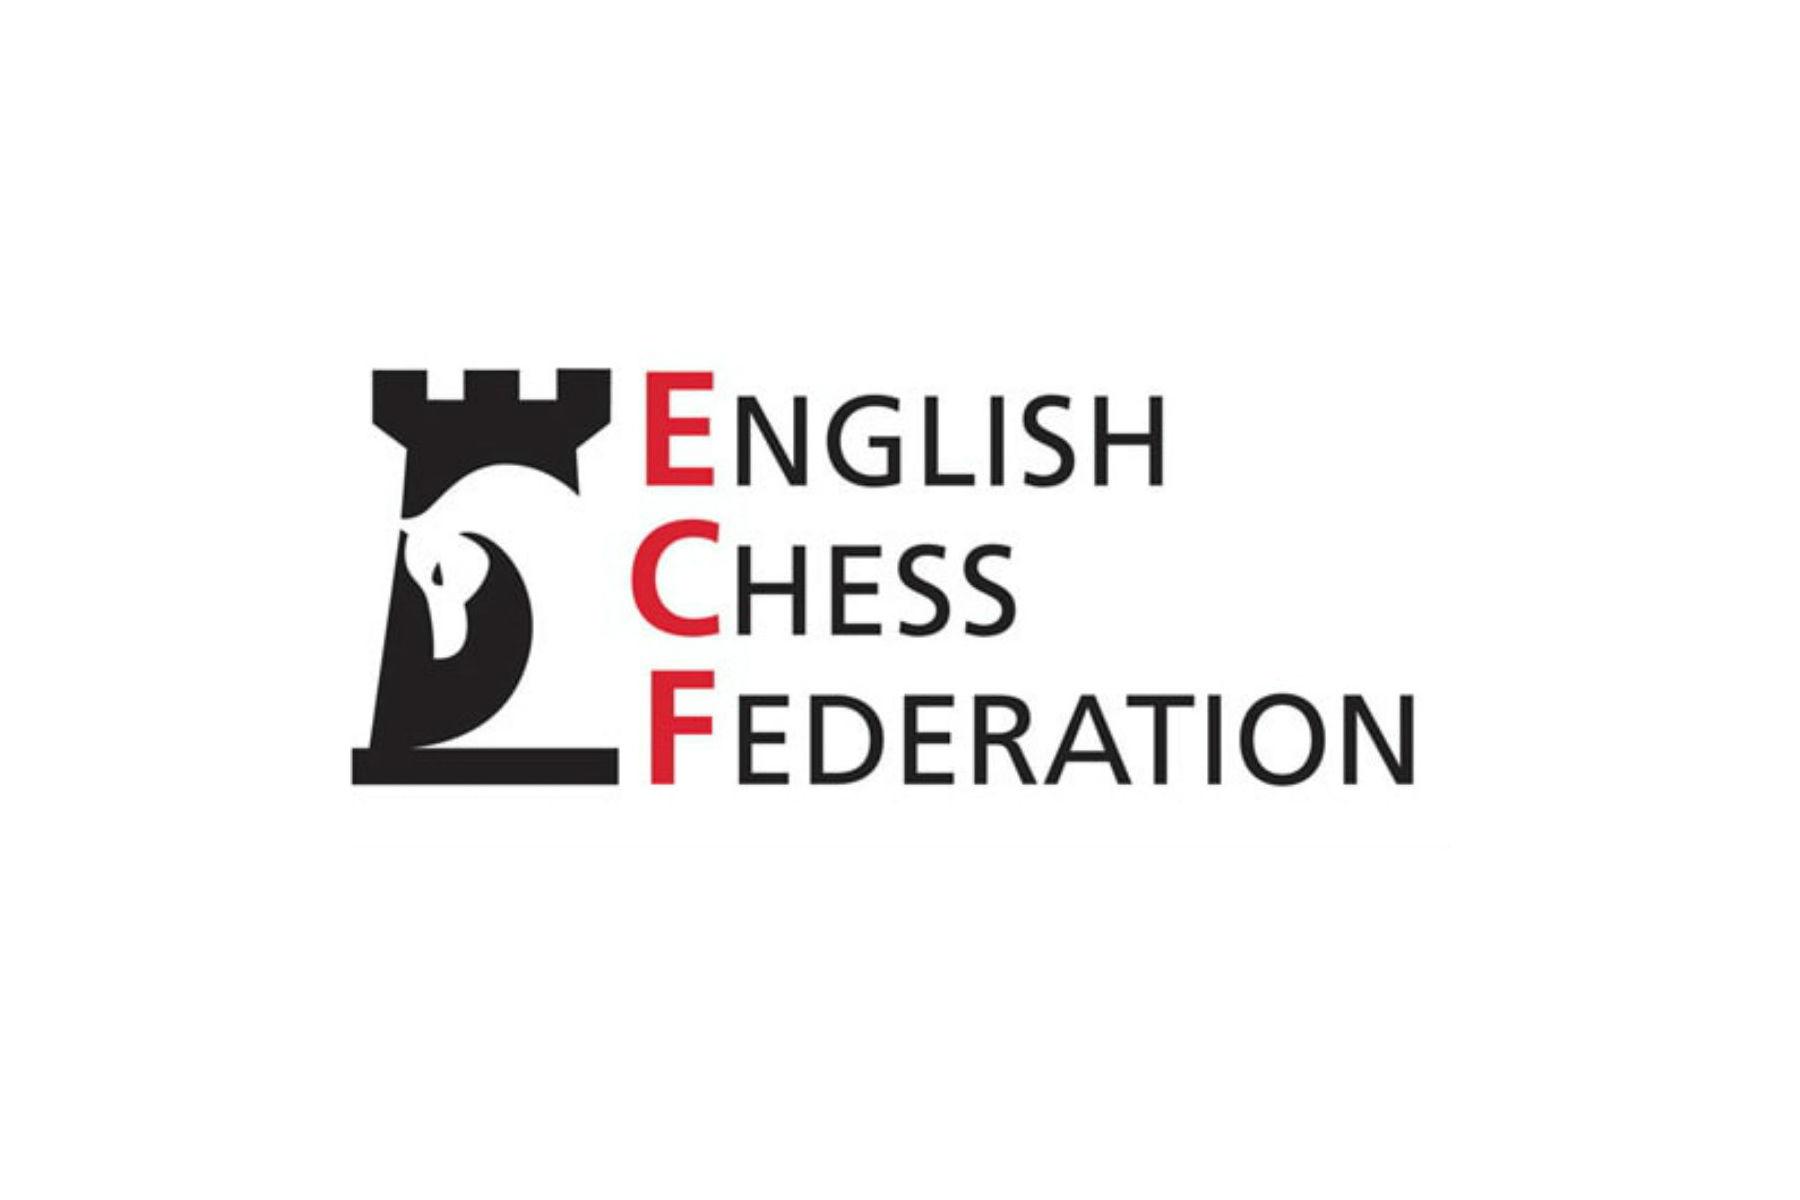 English Chess Federation